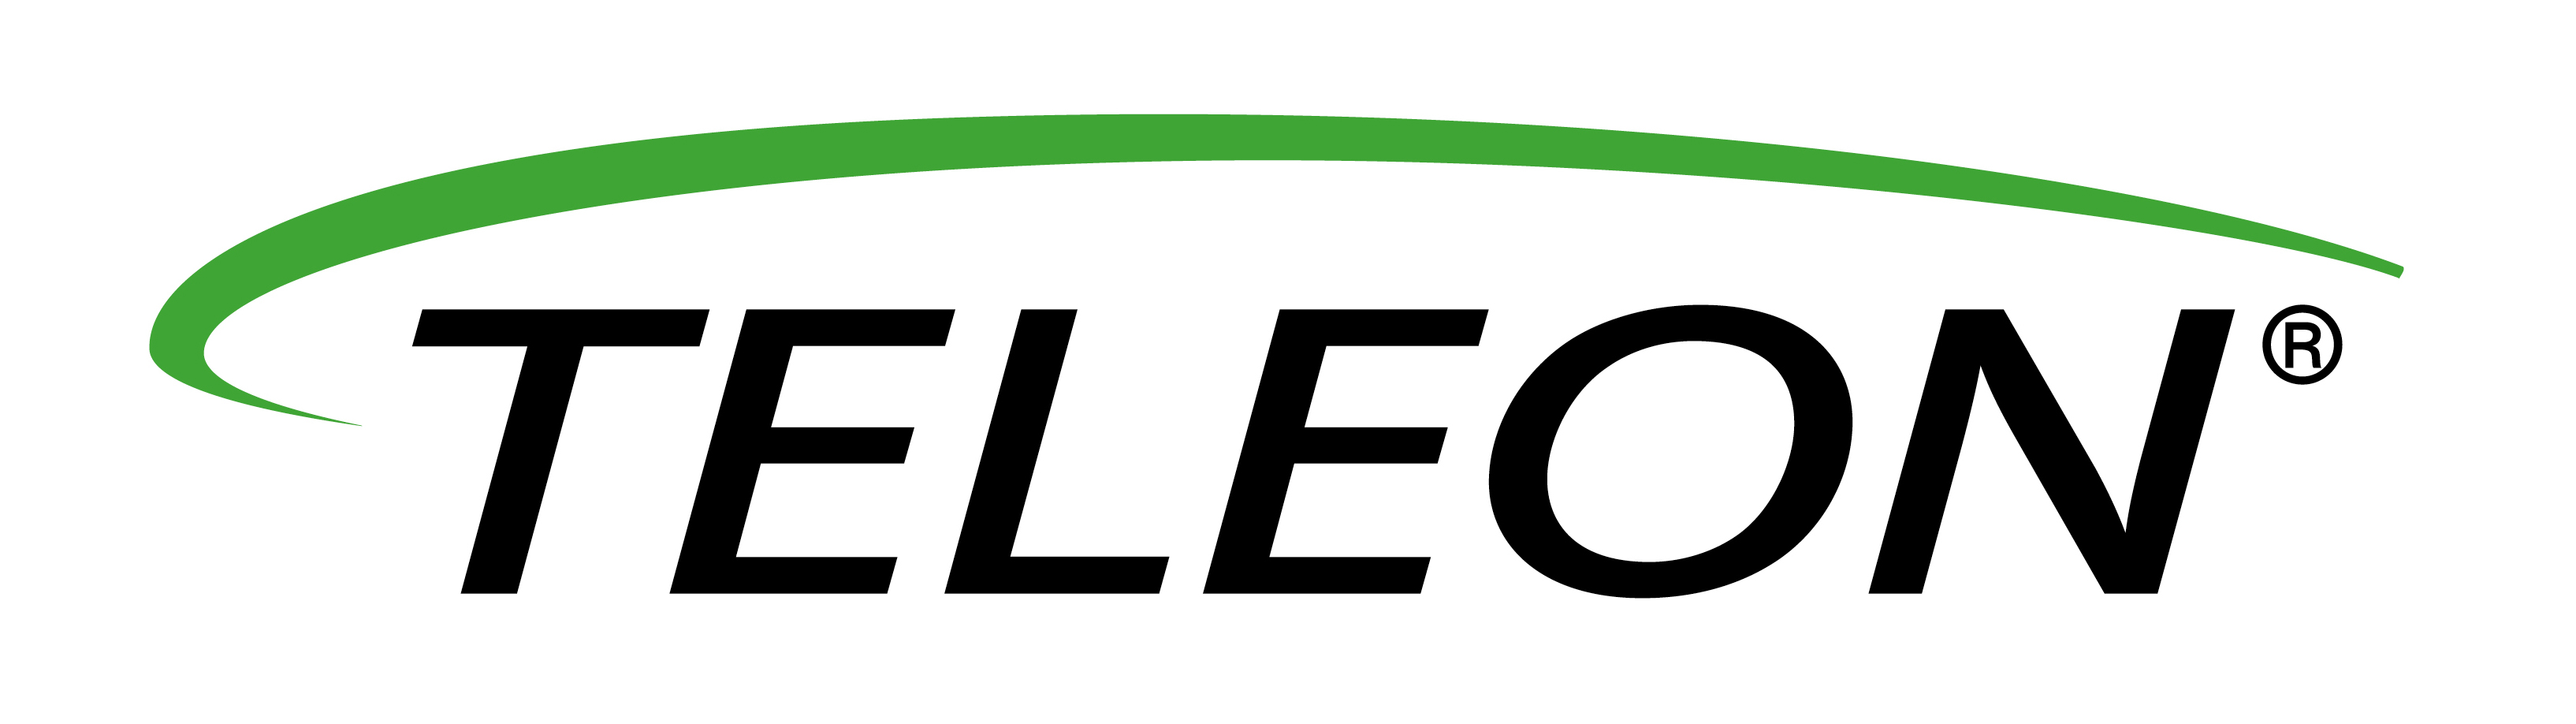 Teleon Surgical GmbH